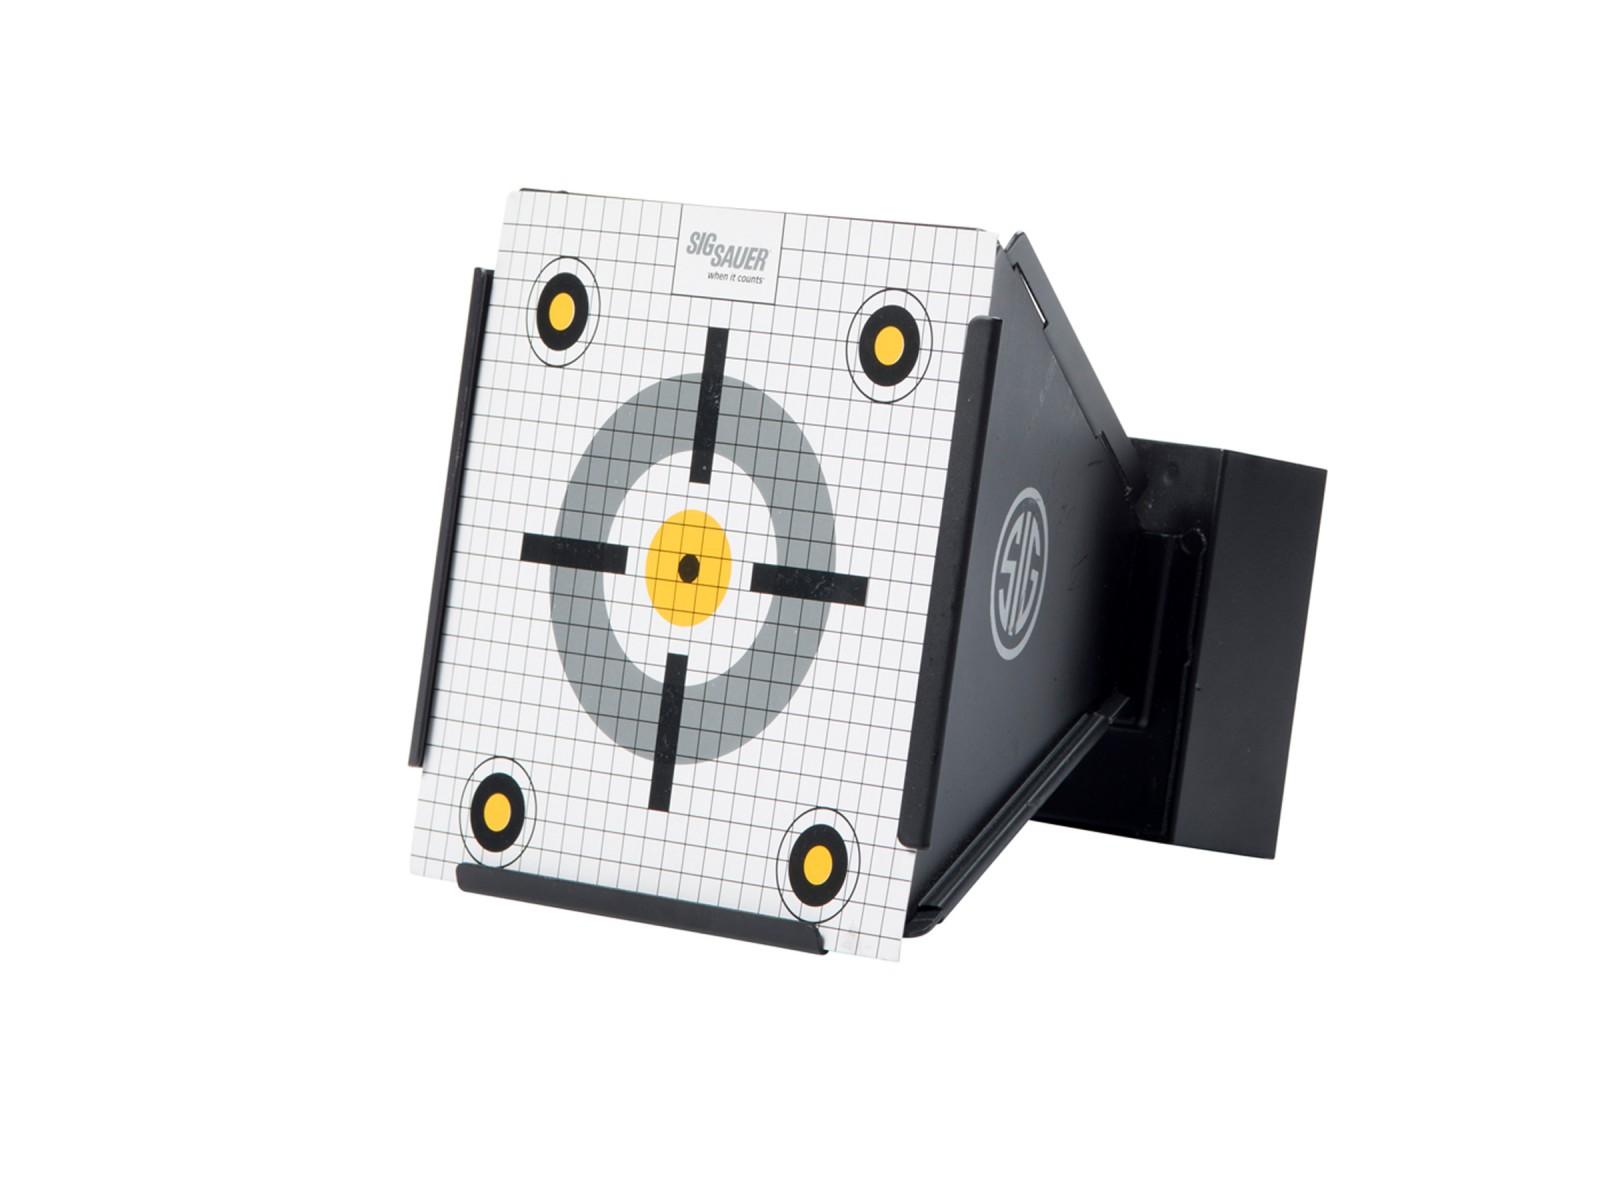 Sig Sauer Pellet Trap Includes 15 Paper Targets